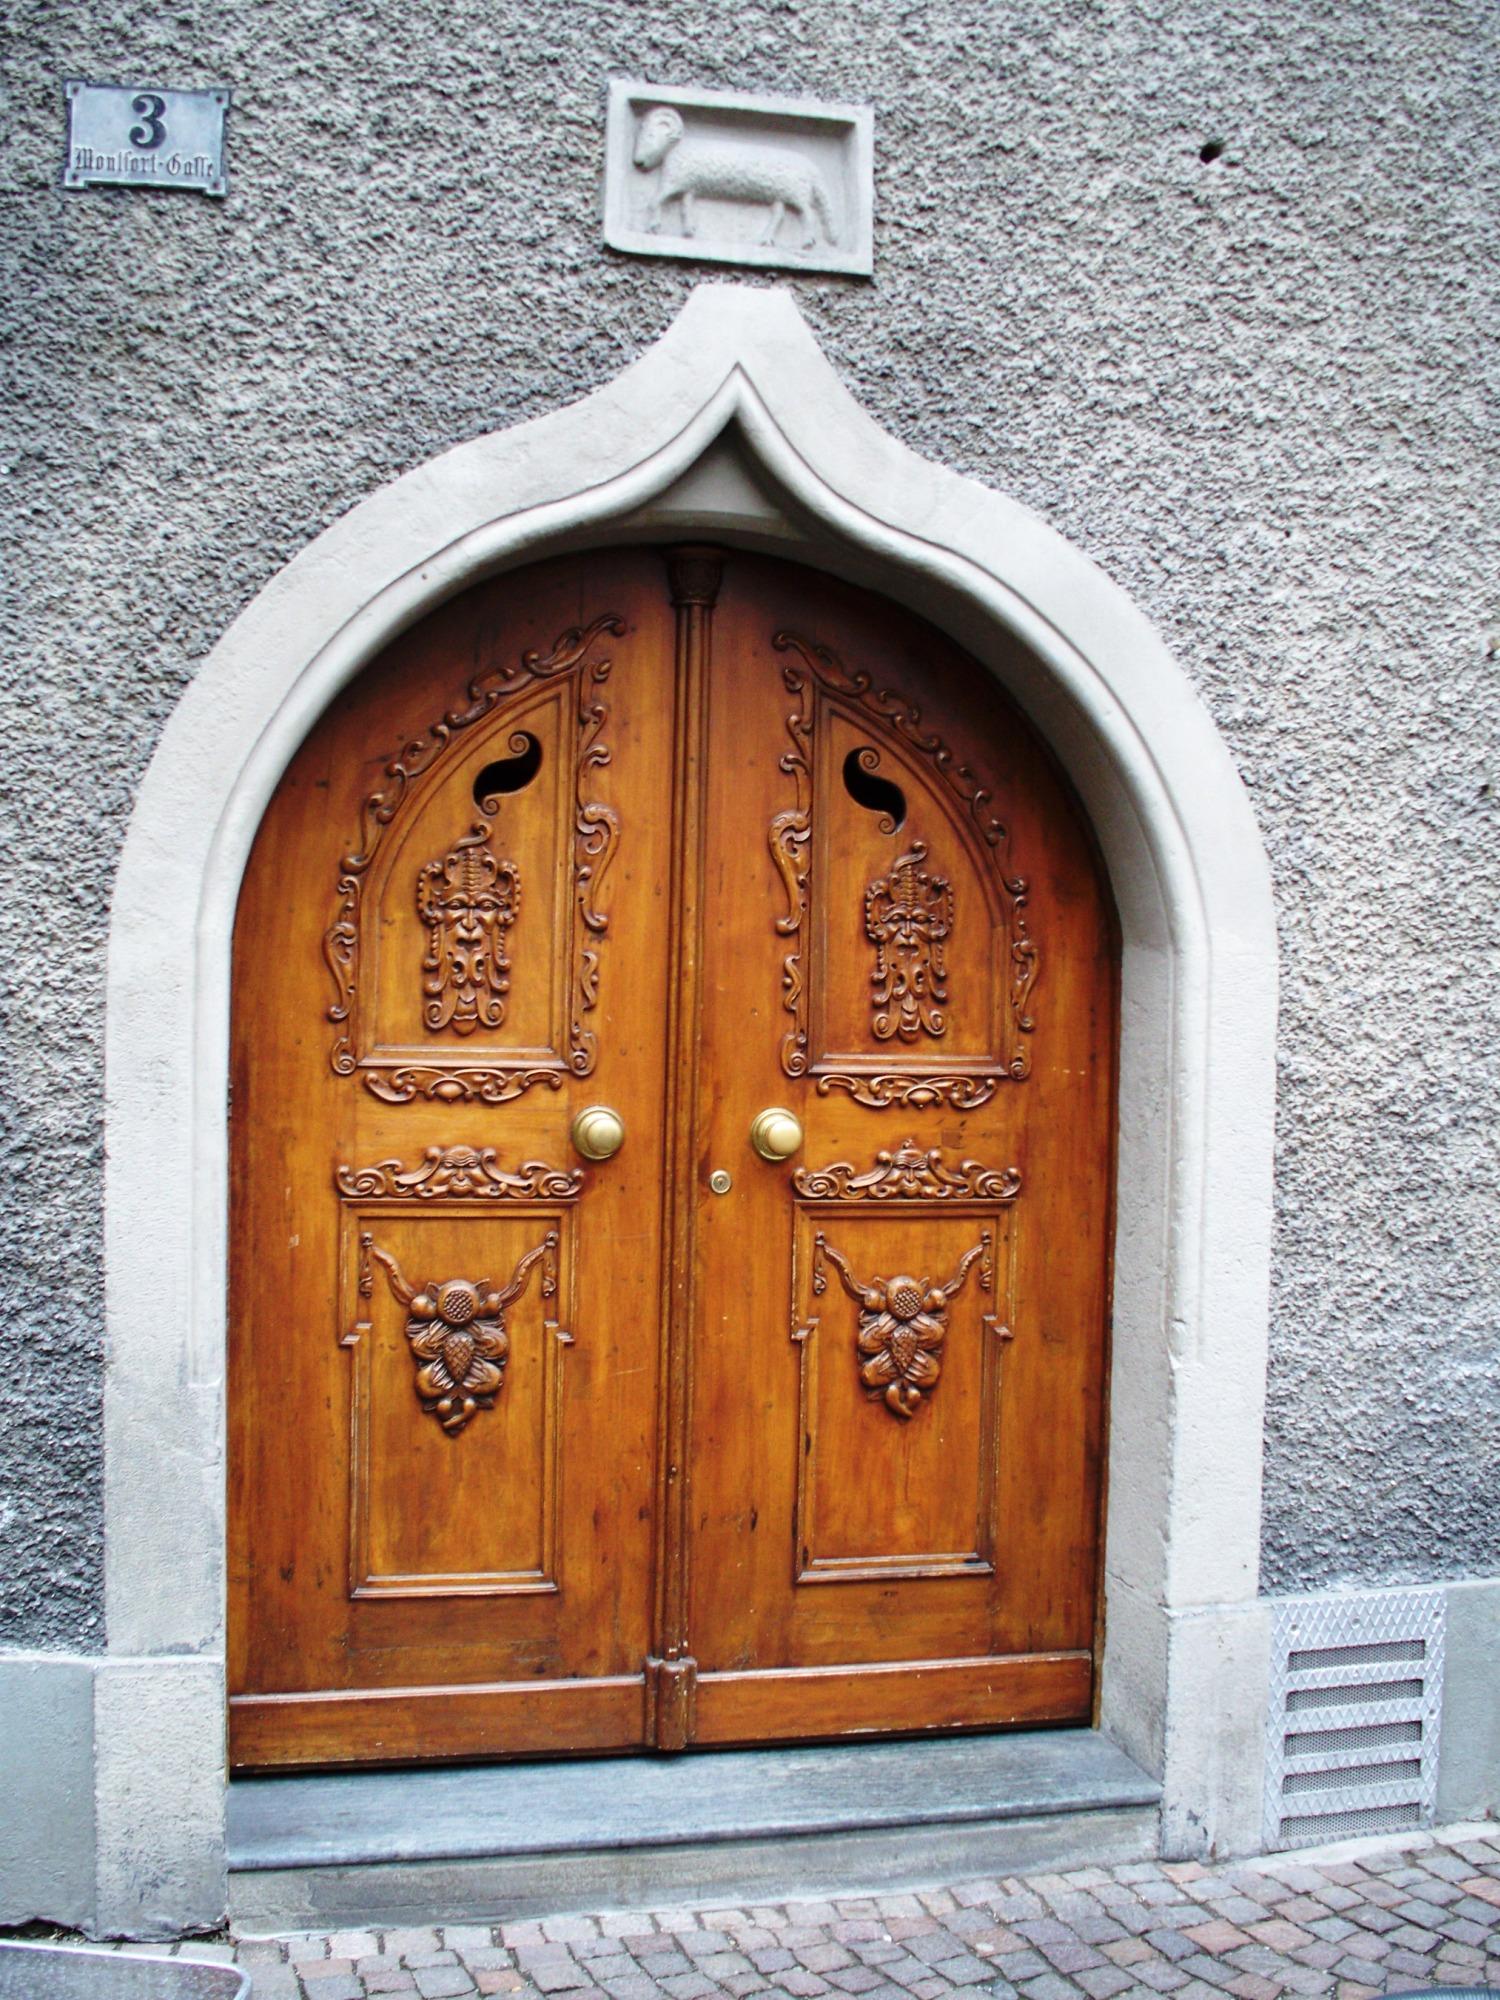 FileHistorical door in Feldkirch.JPG & File:Historical door in Feldkirch.JPG - Wikimedia Commons